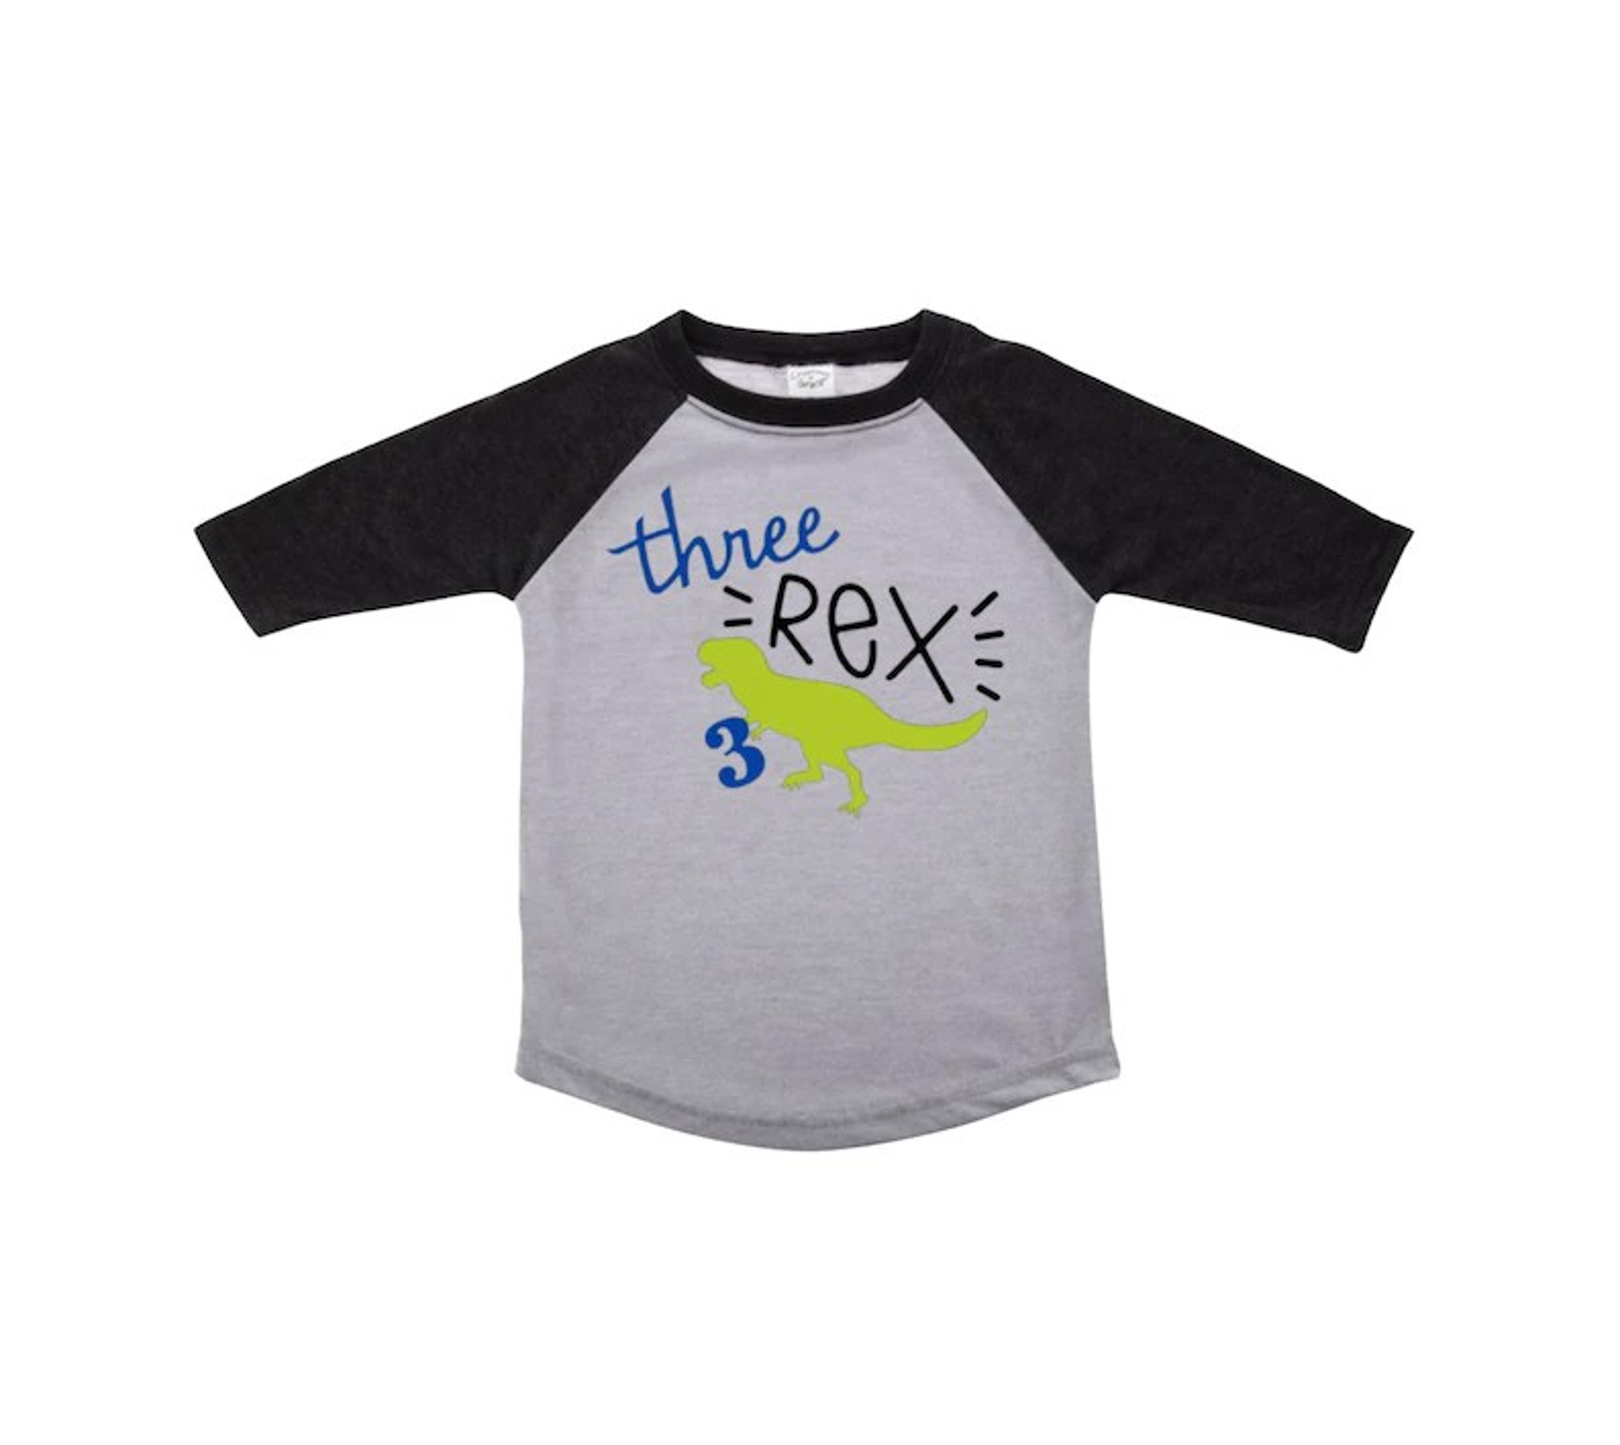 Toddler Birthday Boy Customized Birthday Shirt Third Birthday T Rex 3rd Birthday Raglan Dinosaur Theme Party Three Rex Graphic Tees T Shirts